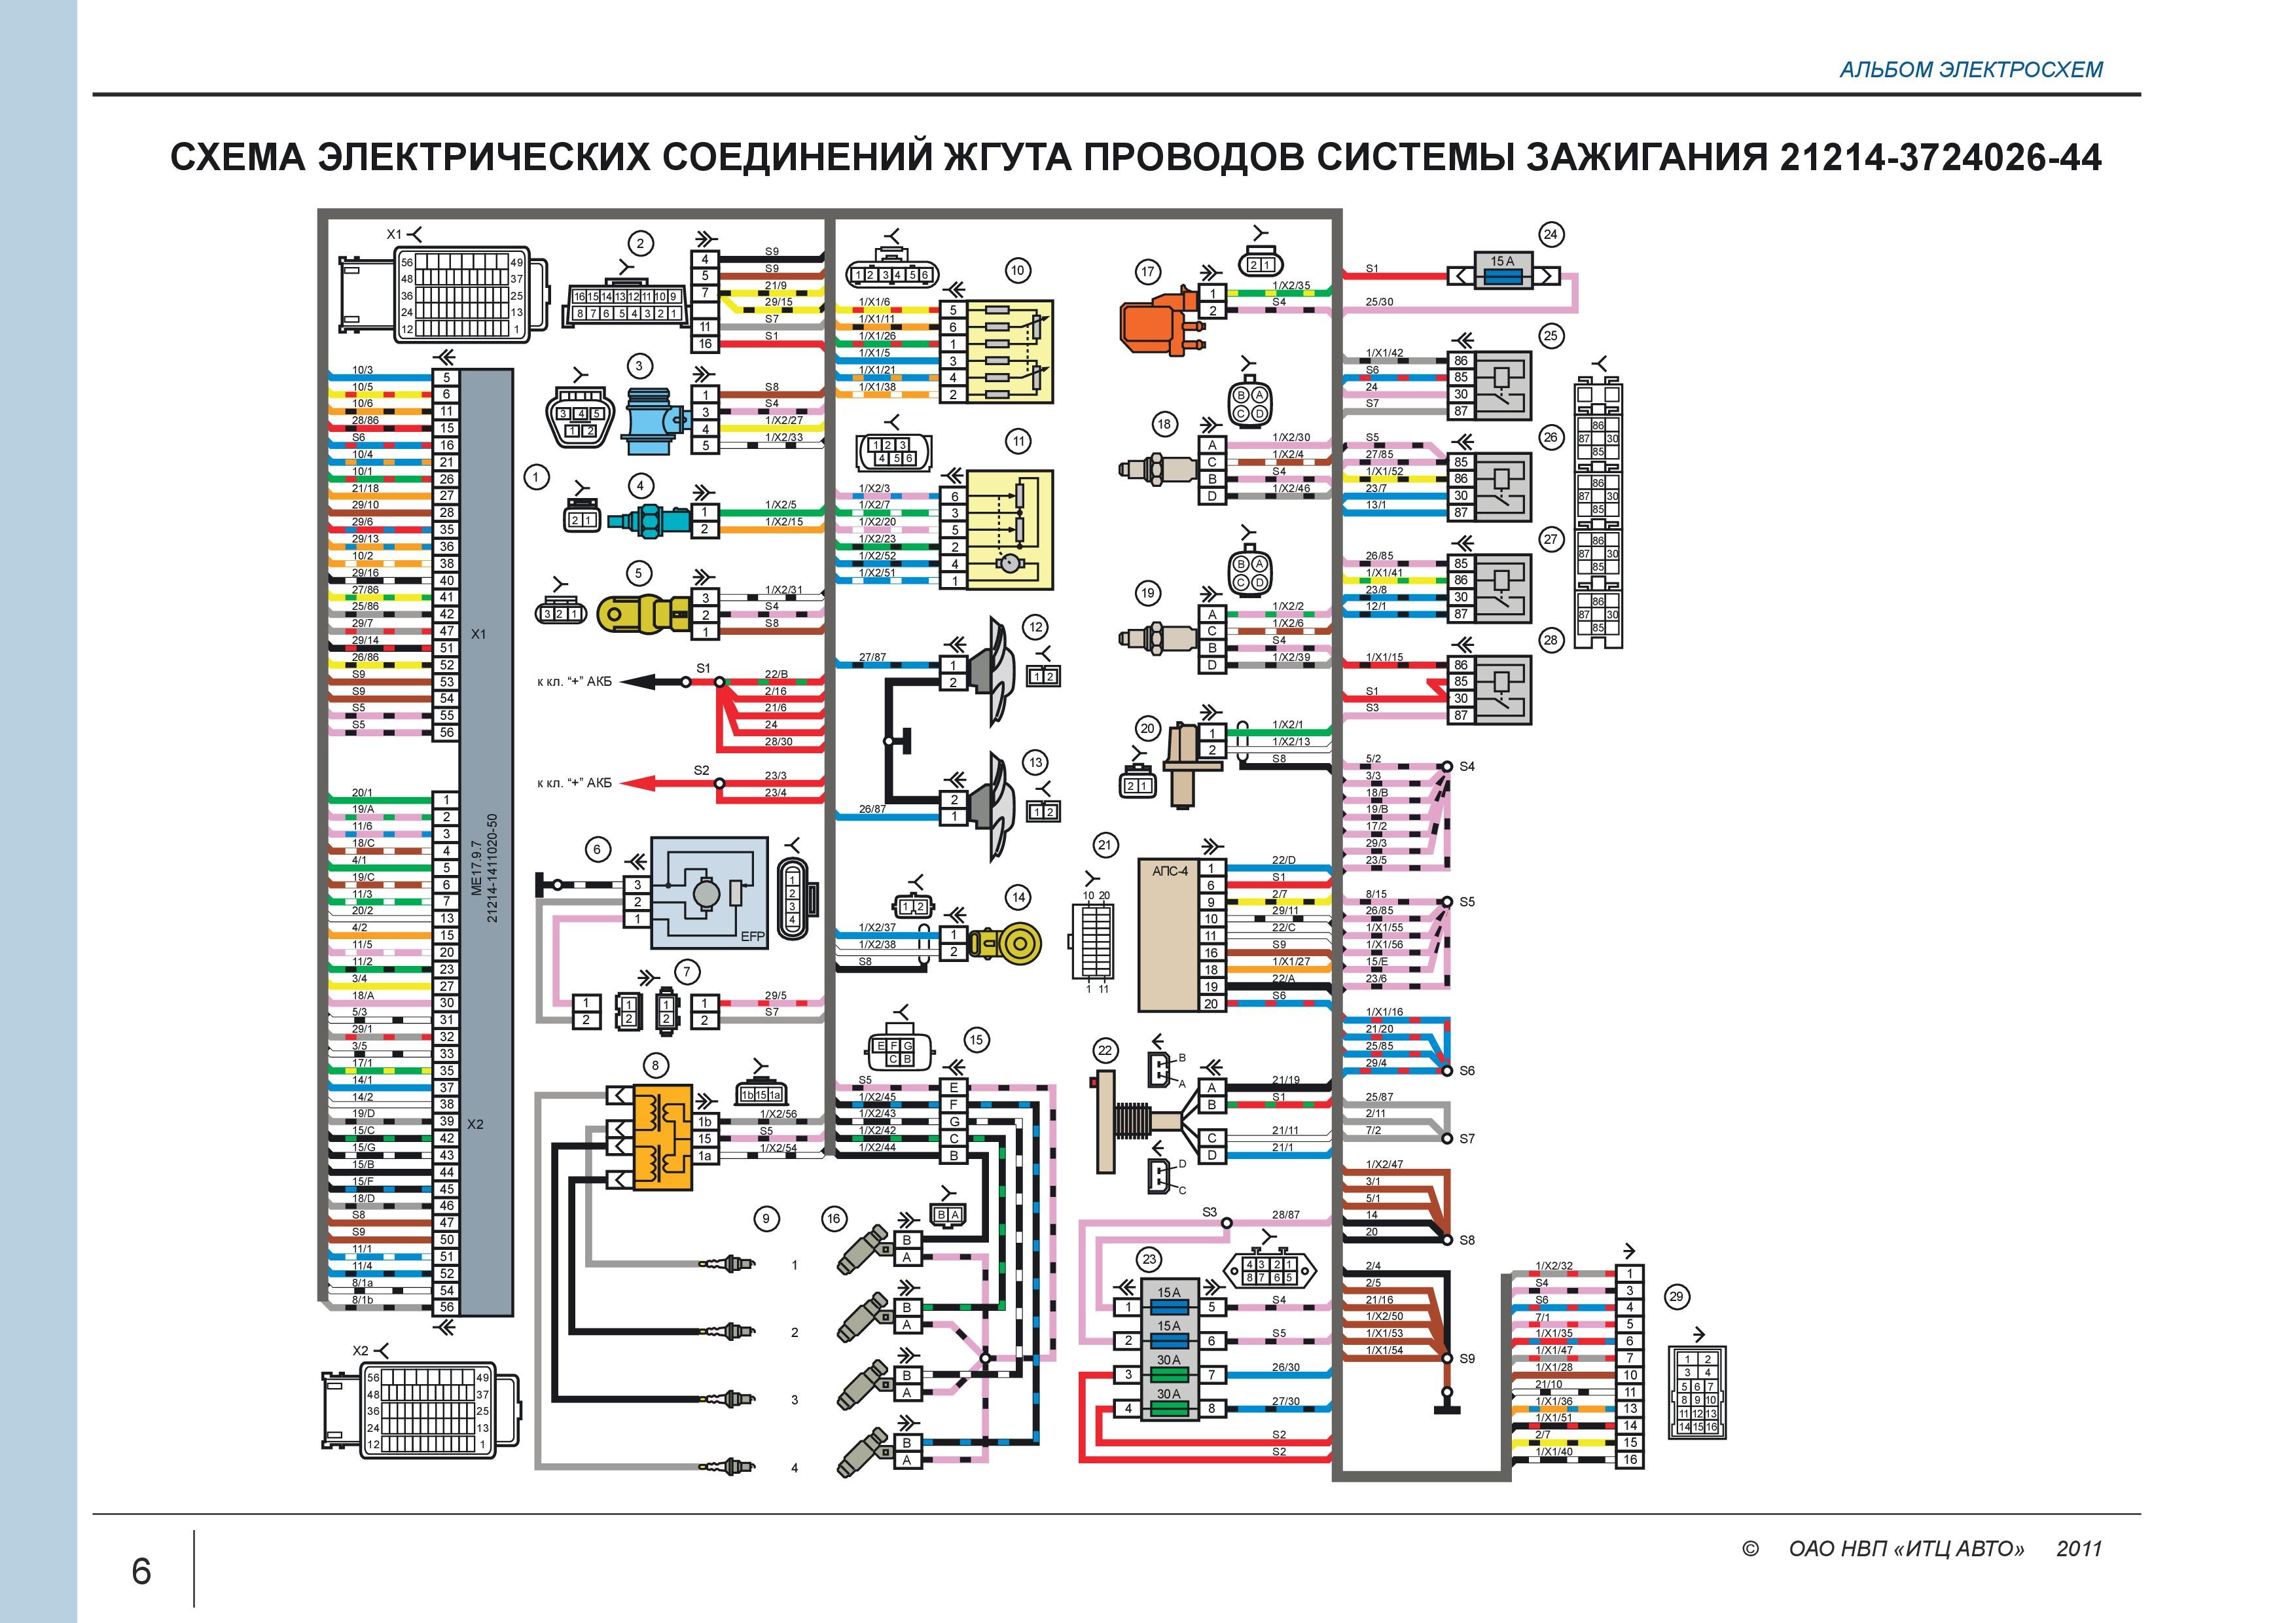 niva elektroshema2 - Электрическая схема ваз 2131 нива инжектор